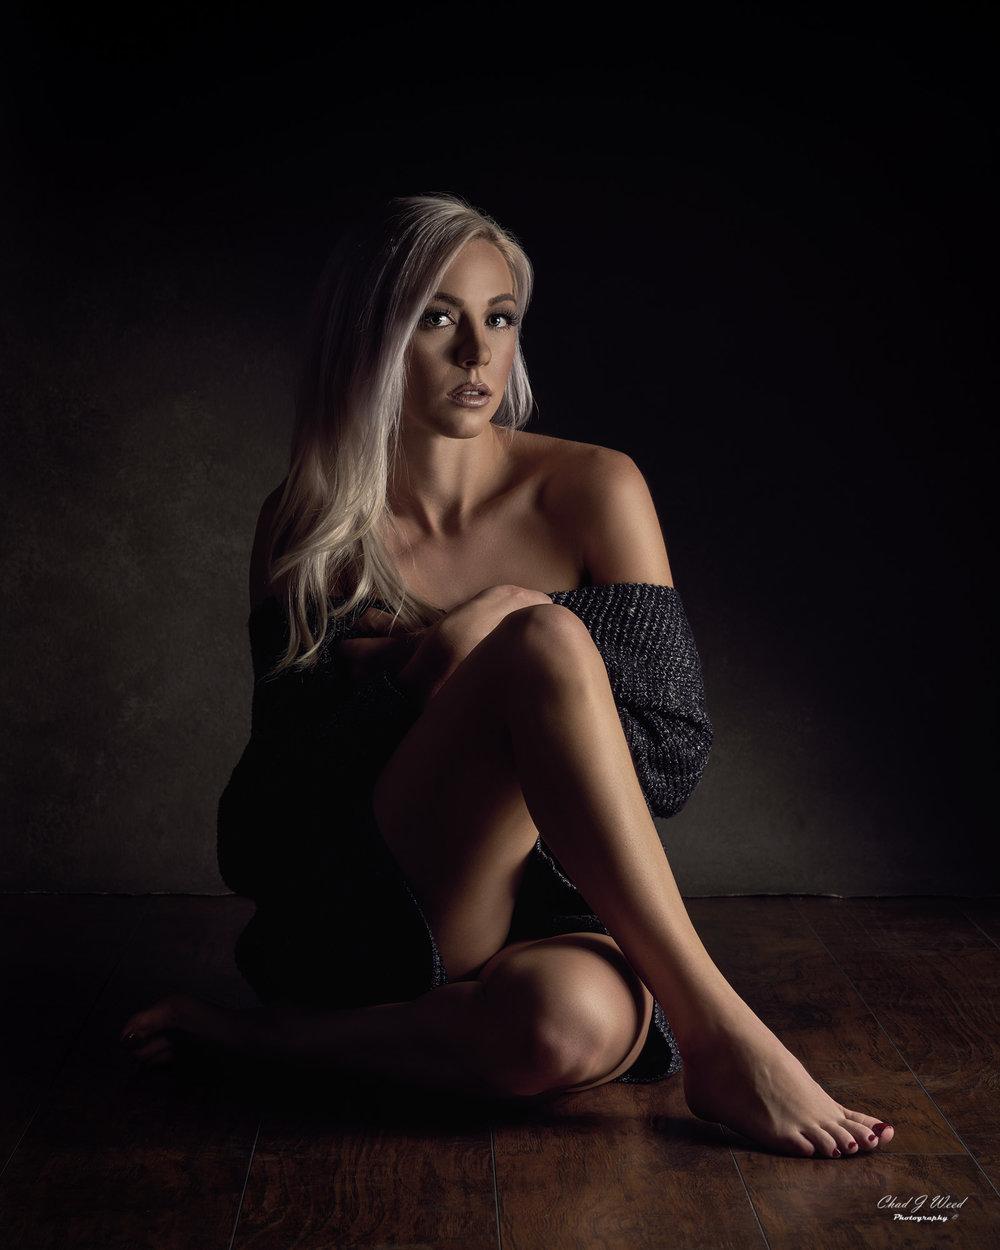 Mesa Arizona Fashion Portrait Photographer Chad Weed of Model Taylor